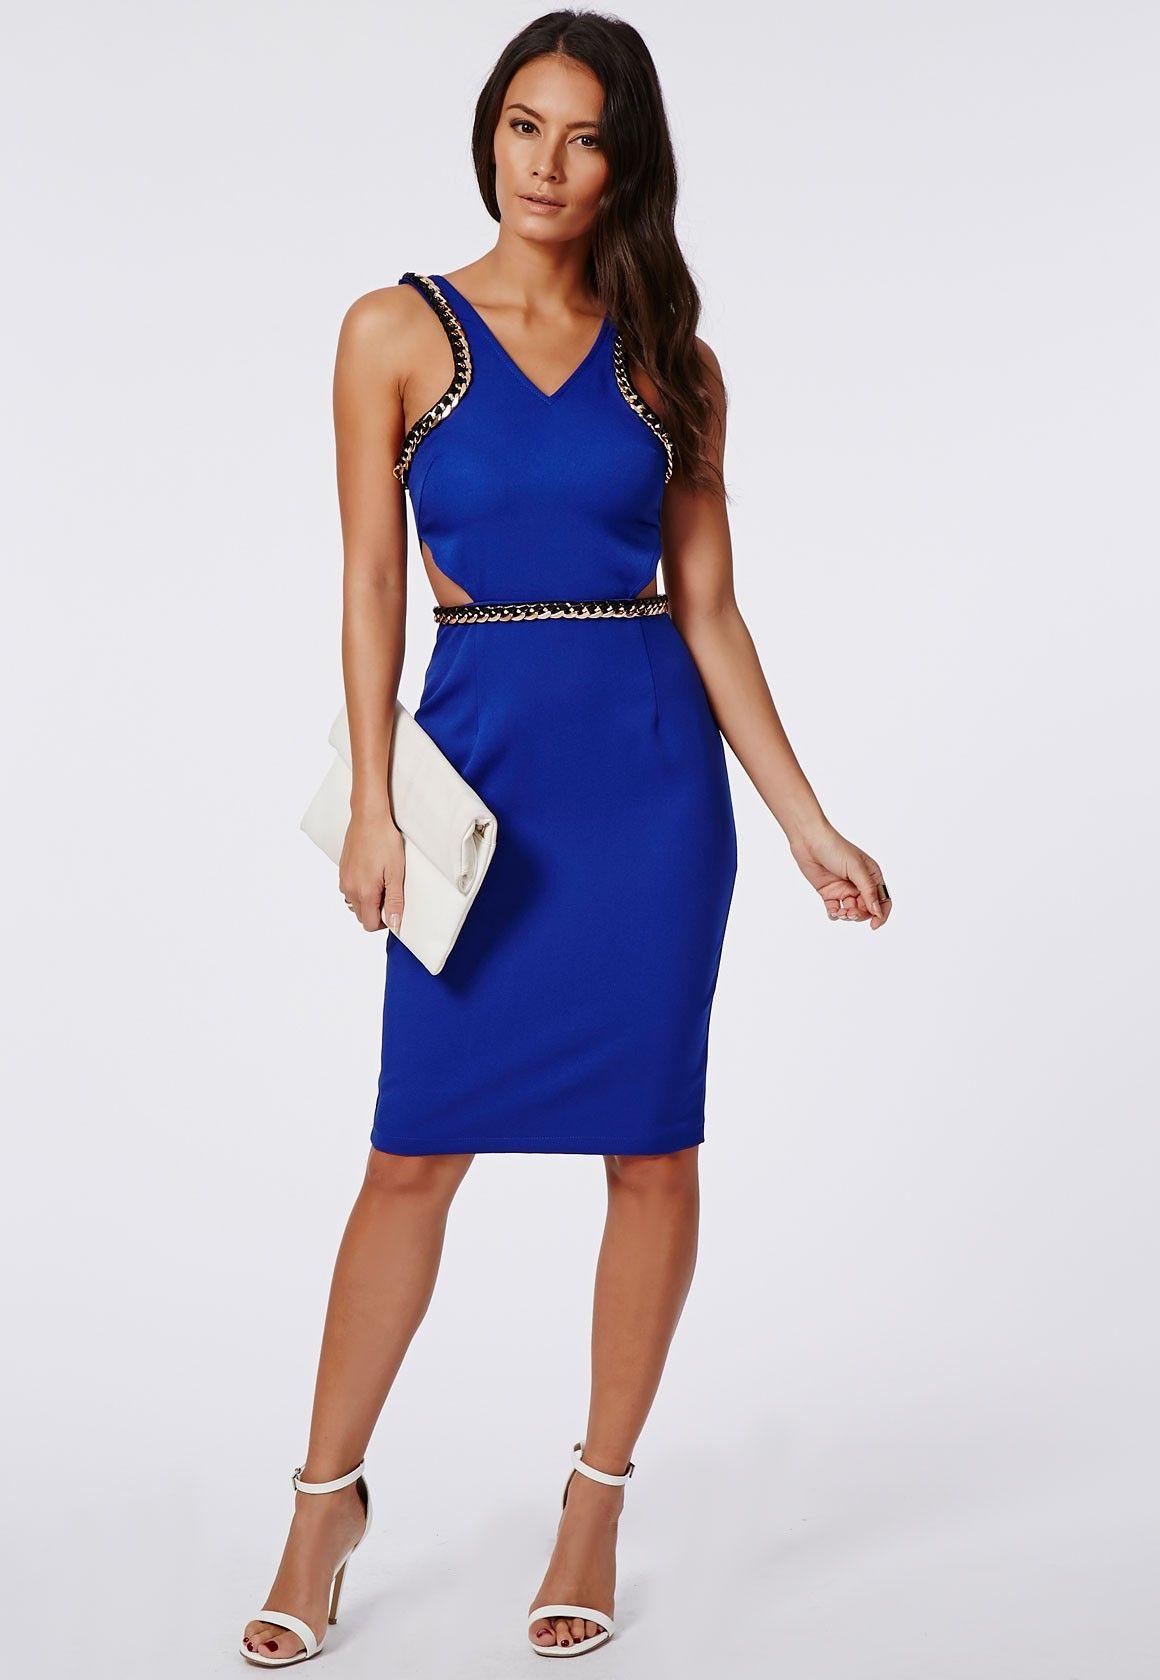 Bodacious Jessie Crepe Chain Trim Midi Dress Cobalt Blue Jessie Crepe Chain Trim Midi Dress Cobalt Blue Midi Dresses Cobalt Blue Dress Long Cobalt Blue Dress Outfit